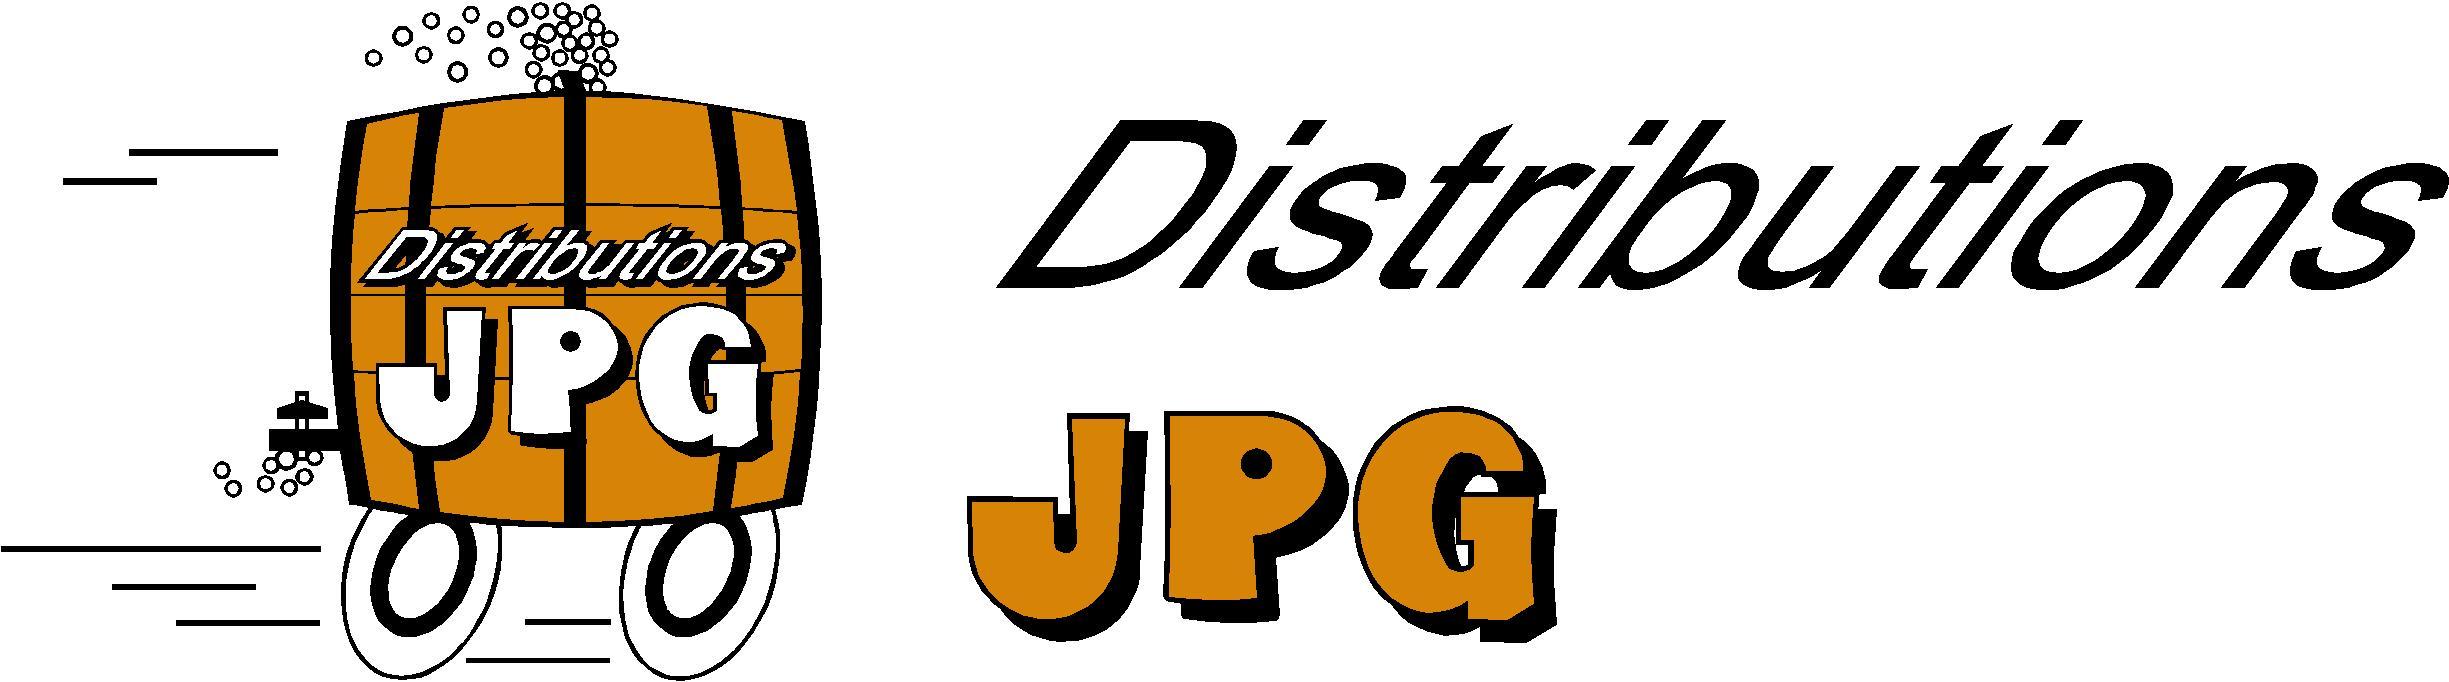 Distribution JPG